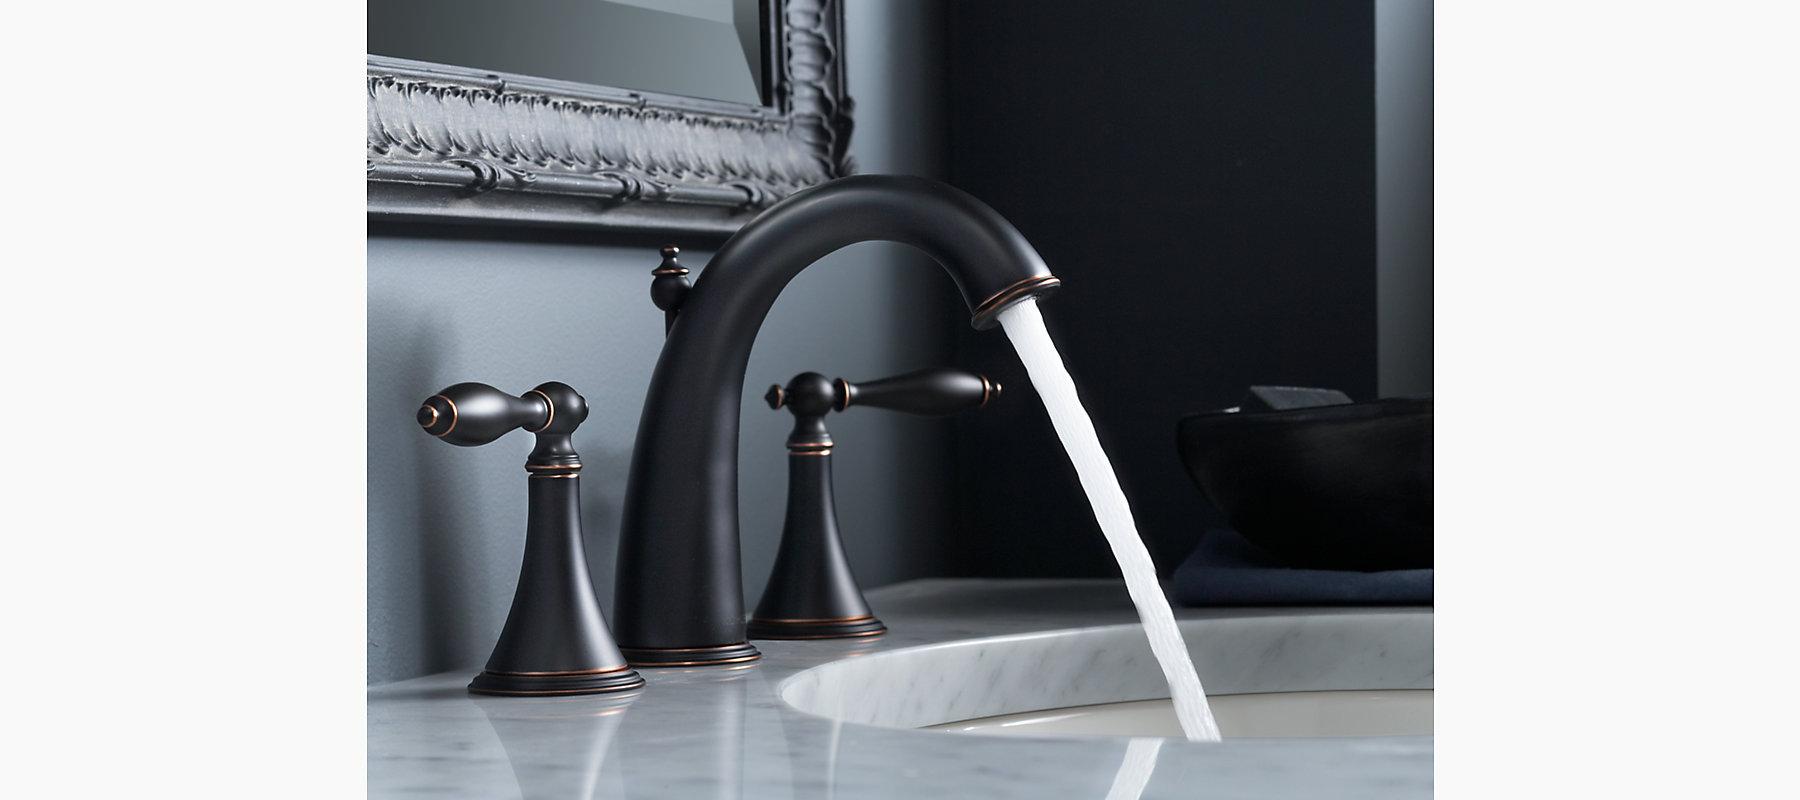 Shop Classic High Spout Oil Rubbed Bronze Bathroom Faucet: Kohler K-310-4M-2BZ Finial Traditional Widespread Lavatory